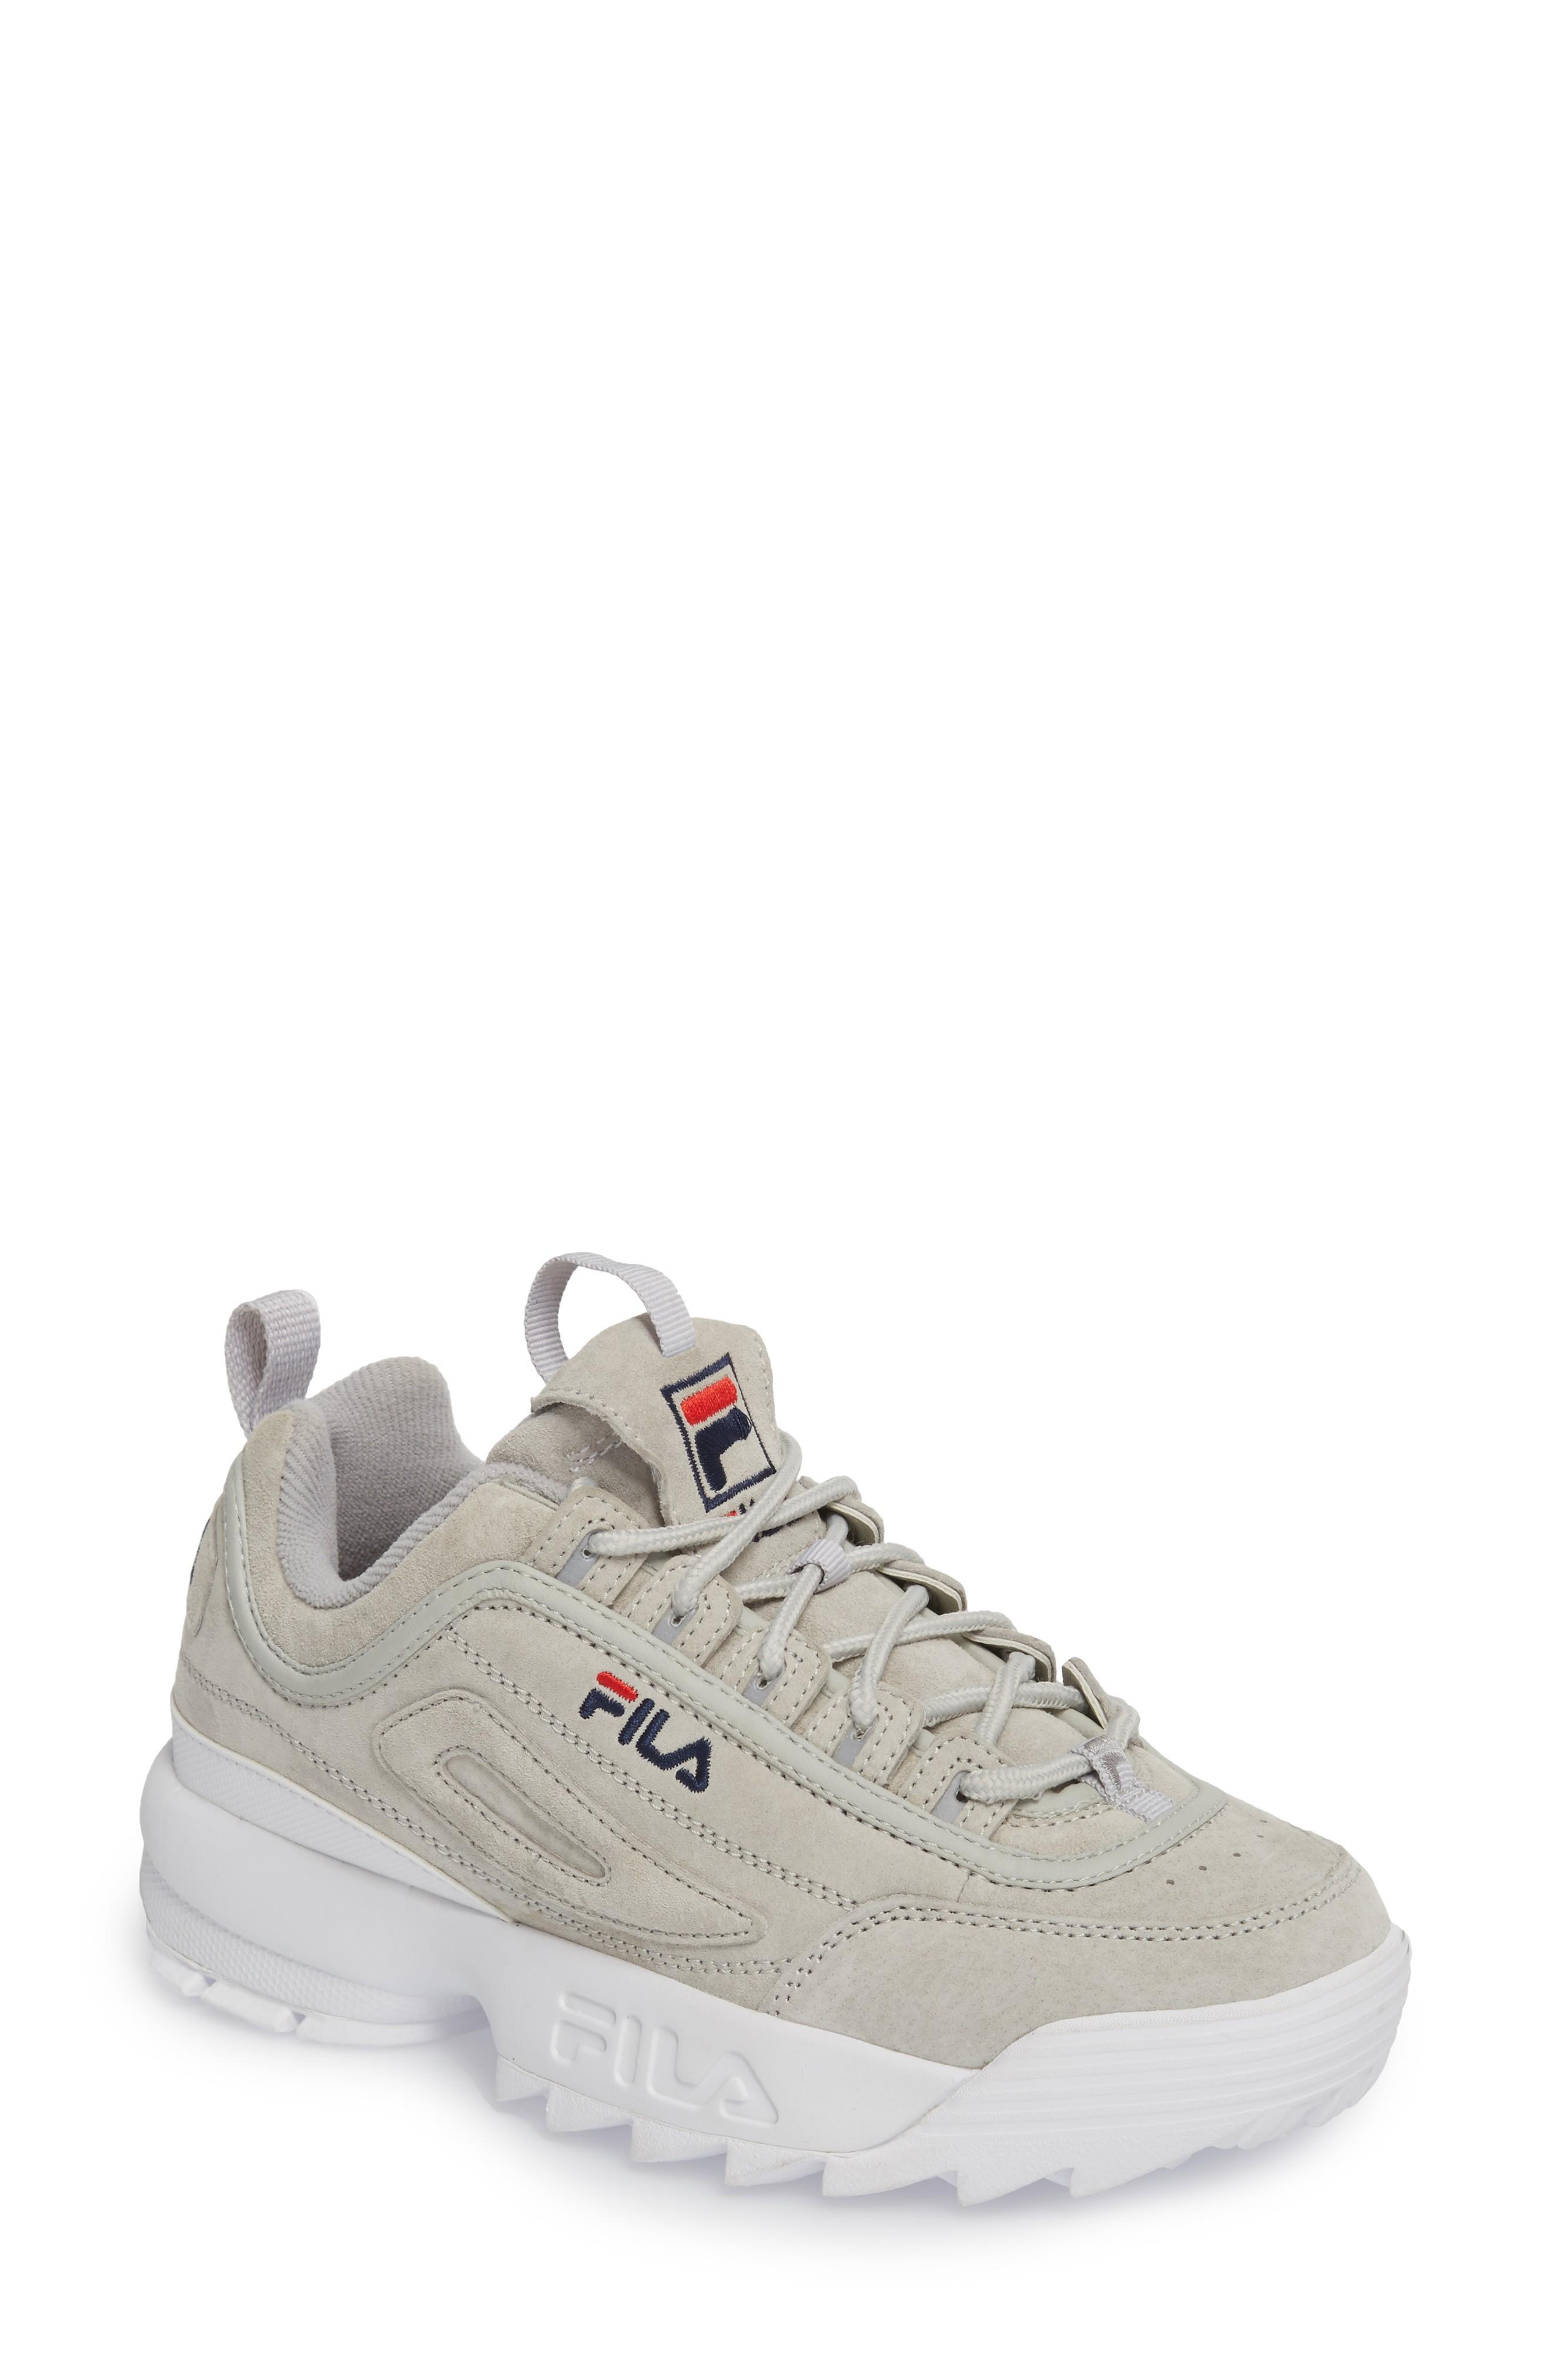 0f72b3fcd55 Fila Disruptor Ii Premium Suede Sneaker In Gryv/ Gryv/ Wht | ModeSens